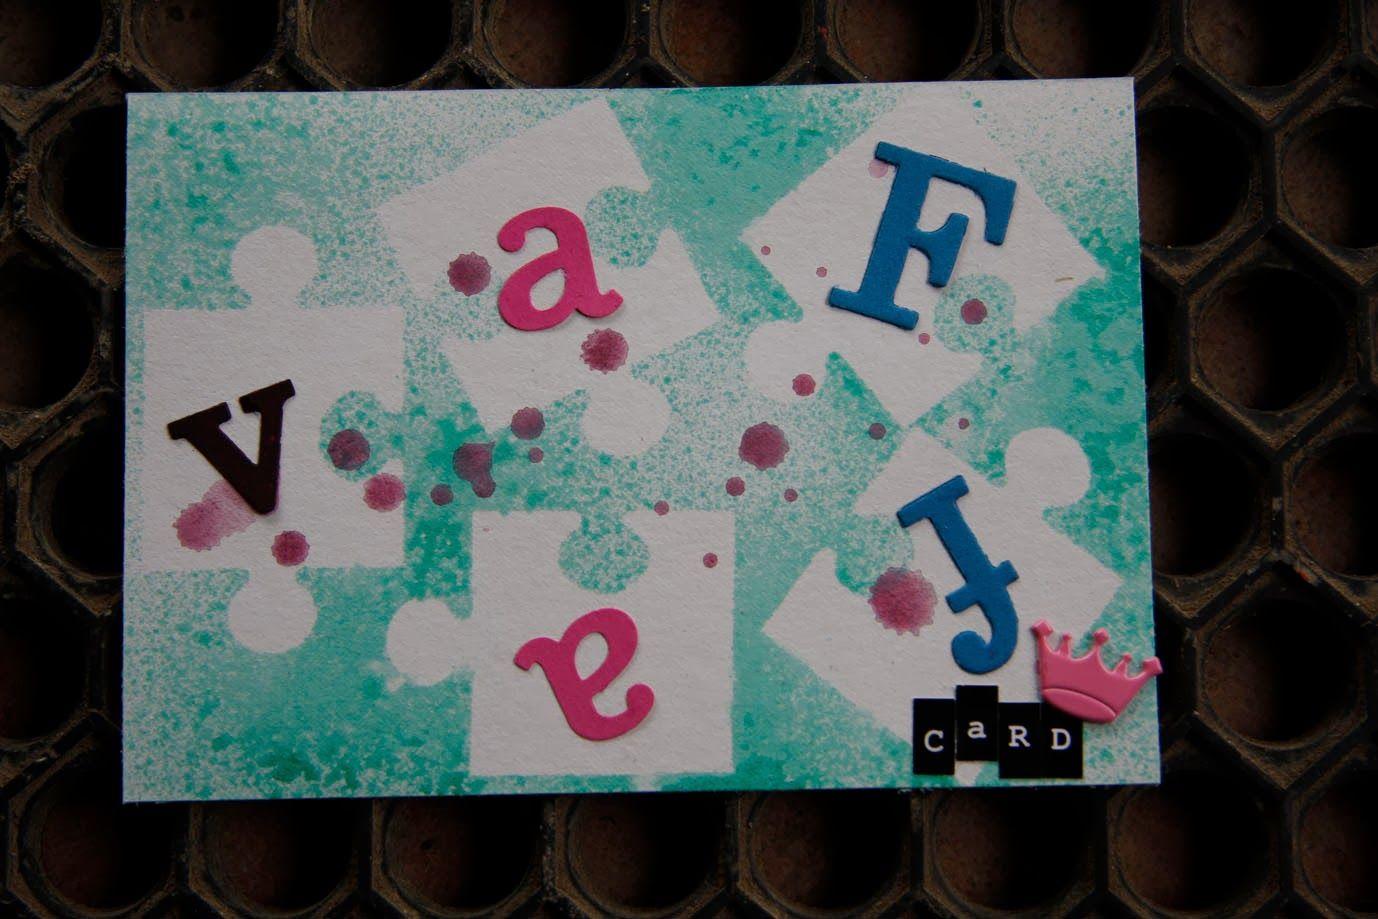 vaffa card